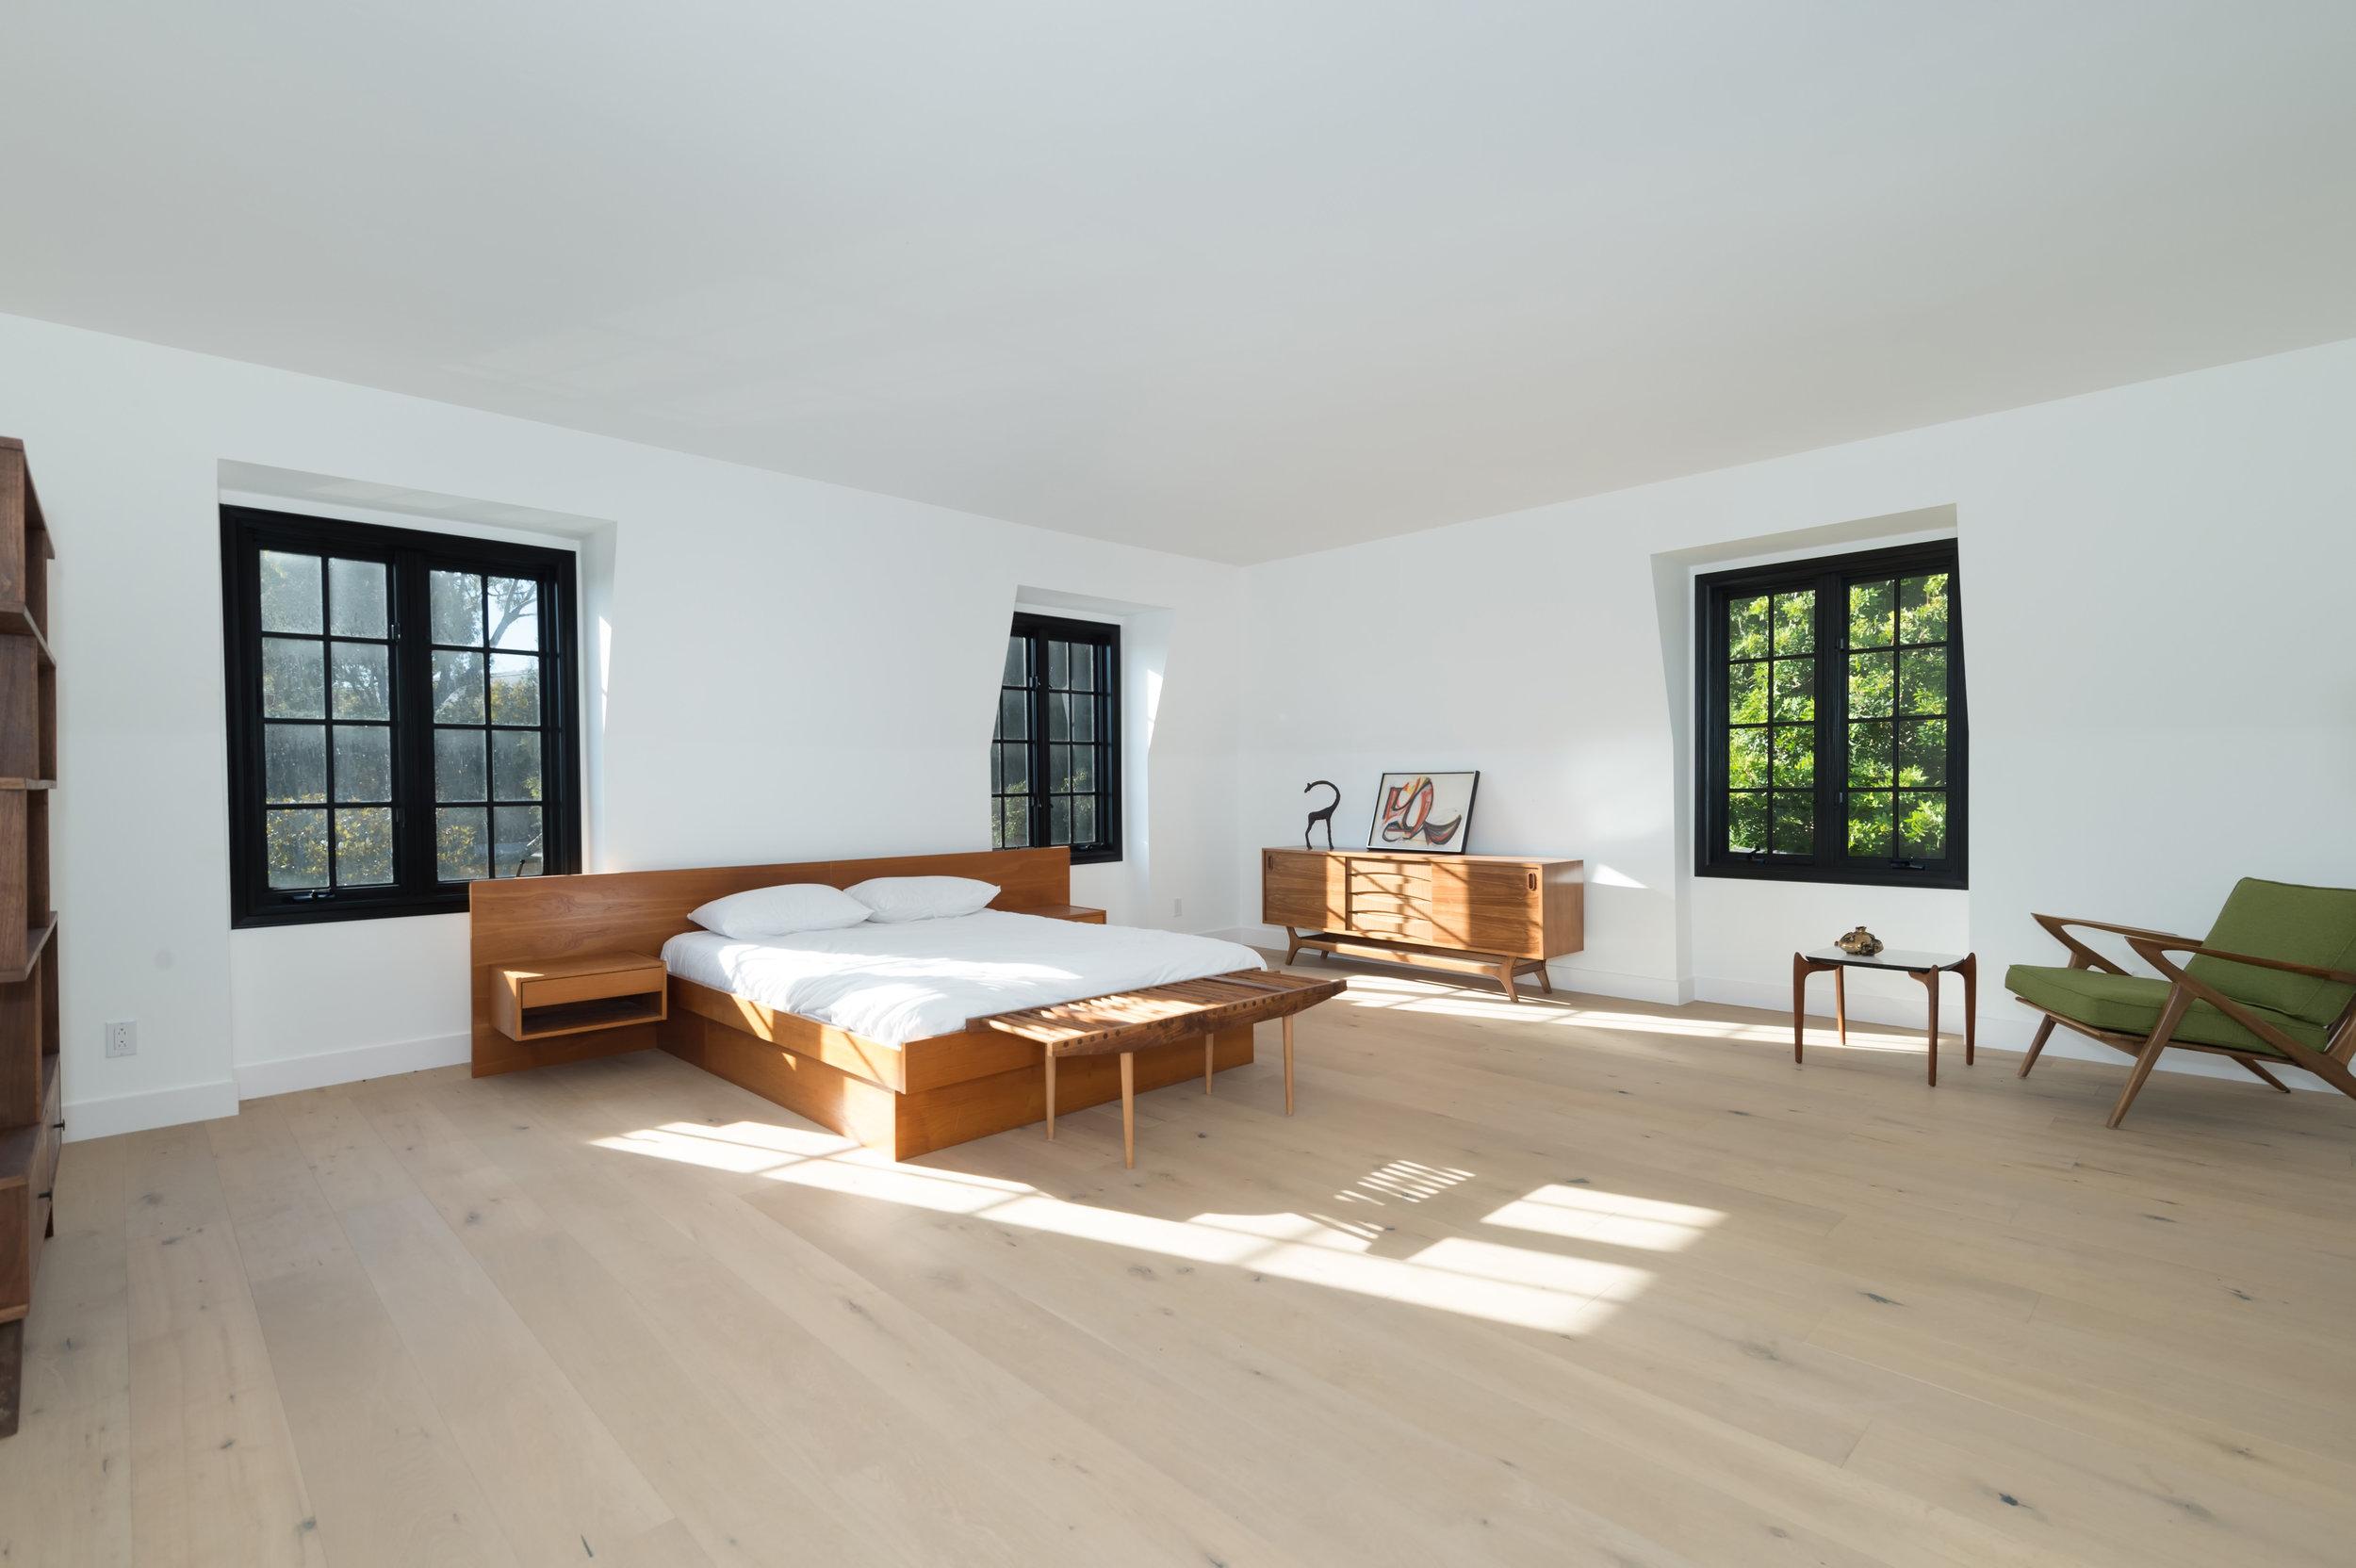 014 bedroom 30340 Morning View Malibu For Sale The Malibu Life Team Luxury Real Estate.jpg